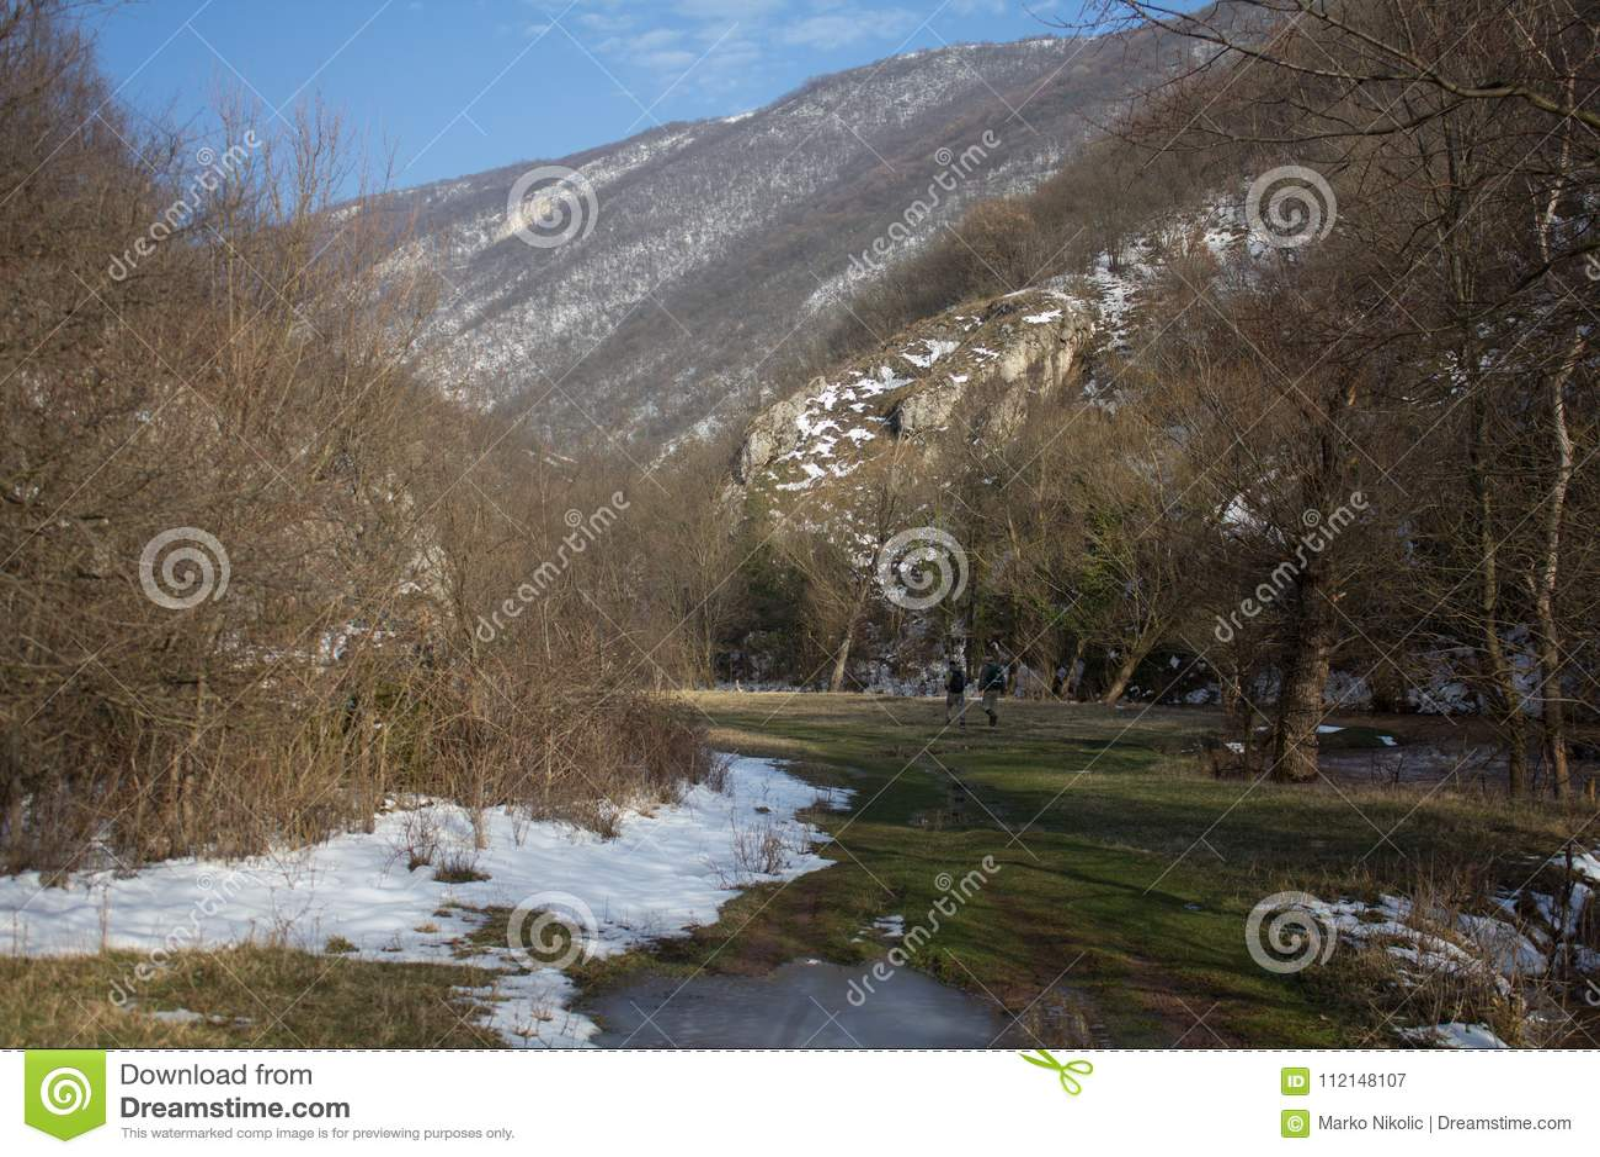 Two men walk through the valley,